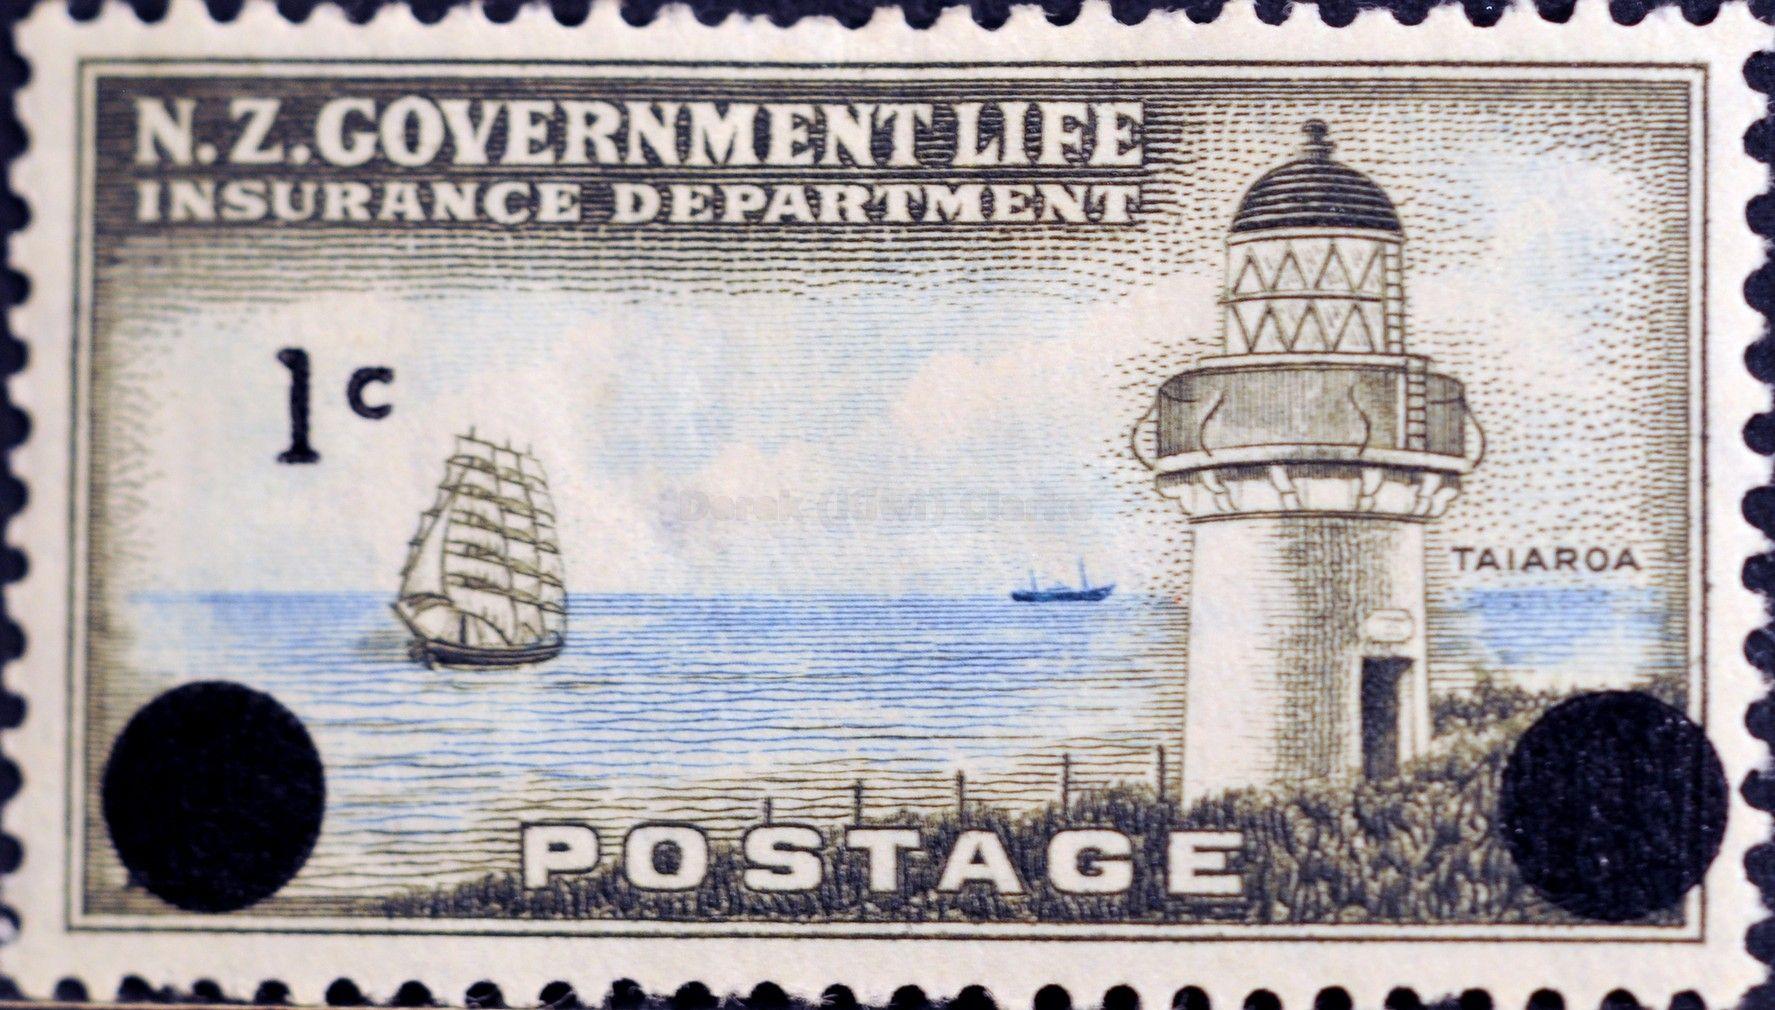 New Zealand 201 1967 Life Insurance Department Lighthouse